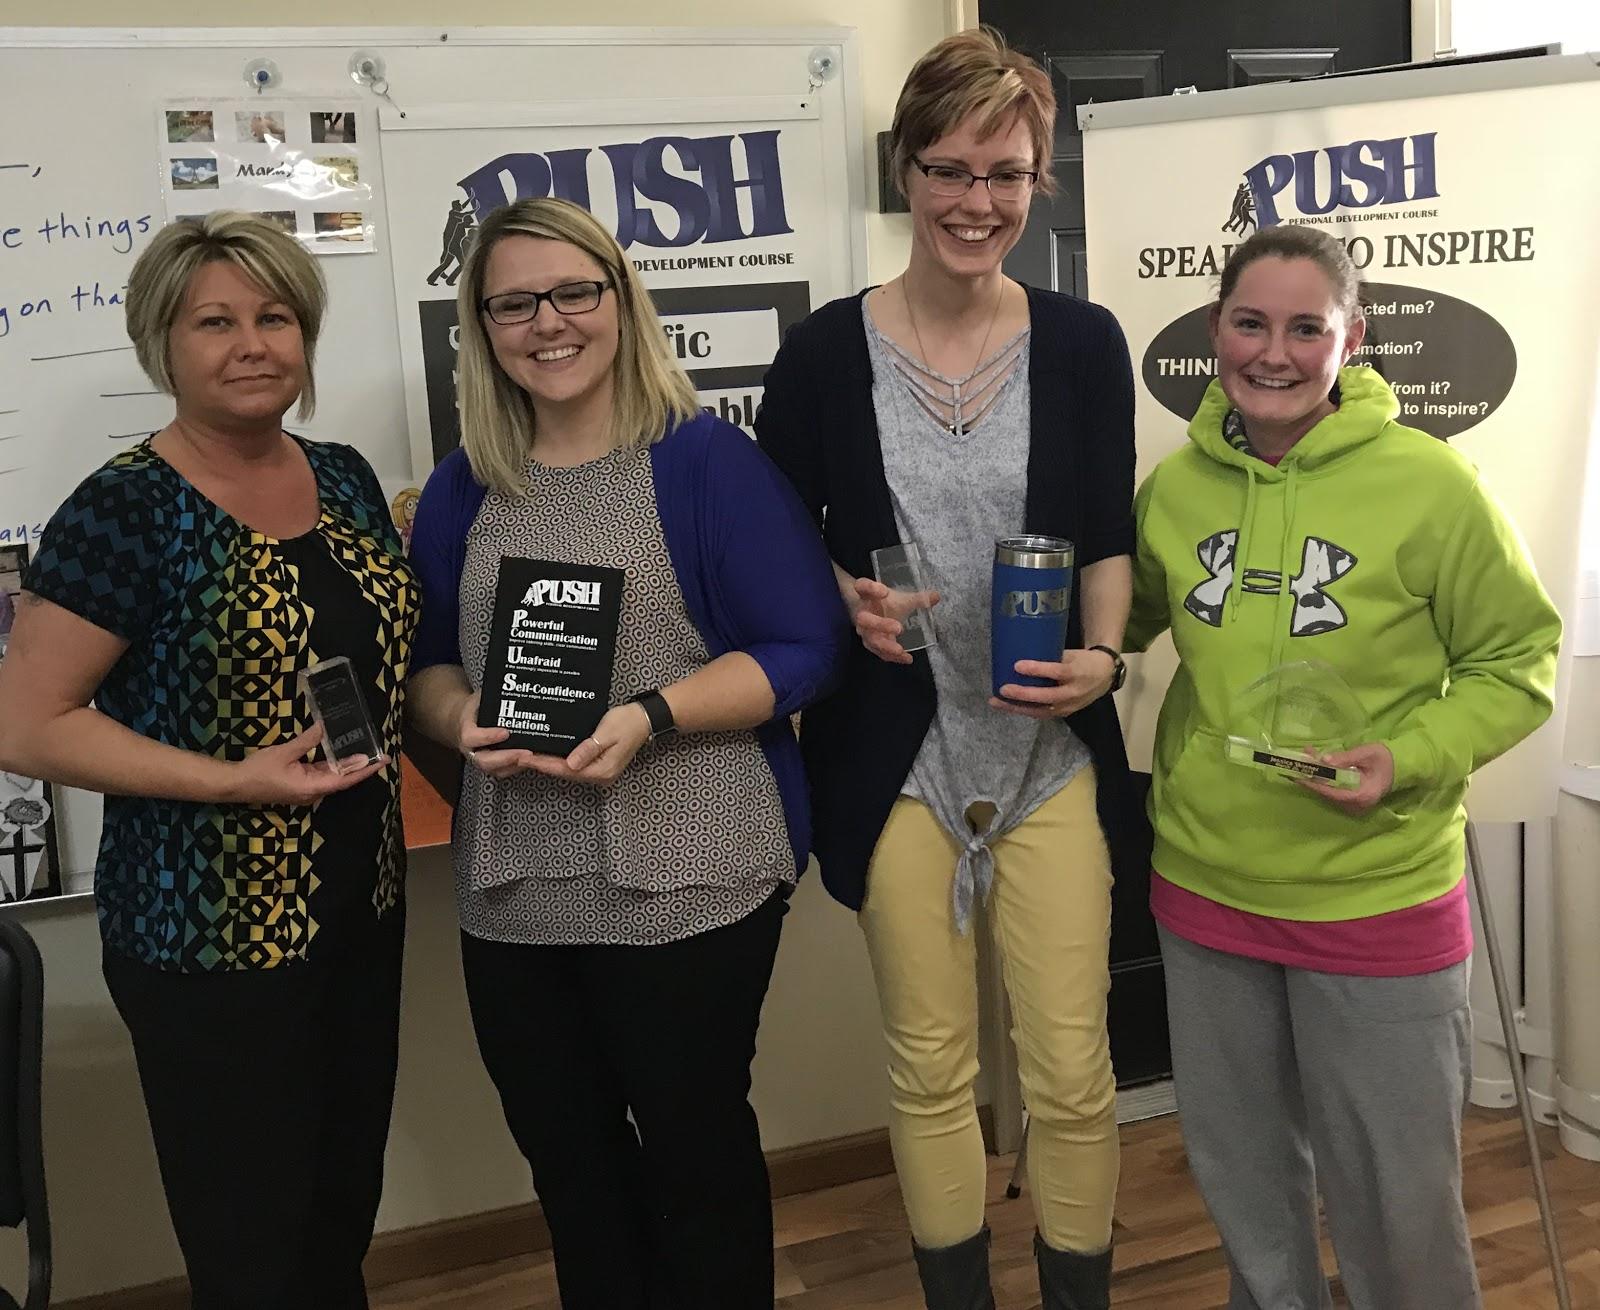 Award recipients at Session 12 of the Mitchell, SD PUSH class, 3/26/18 Krintina Baysinger, Mandy Stevens, Randi Pietz, and Jessica Skinner